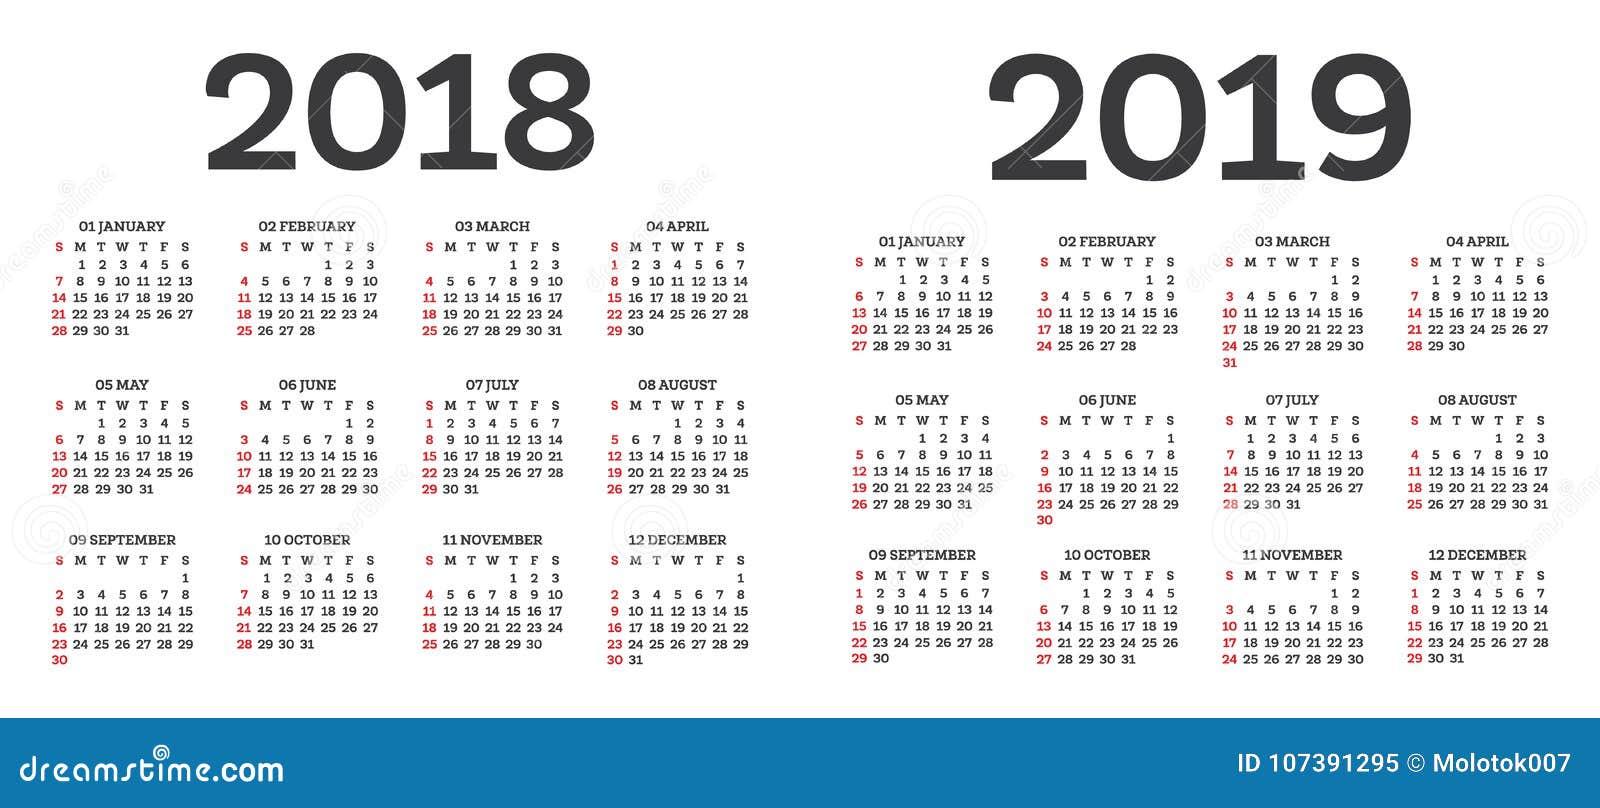 Calendario 2019 Illustrator.Calendar 2018 2019 Isolated On White Background Stock